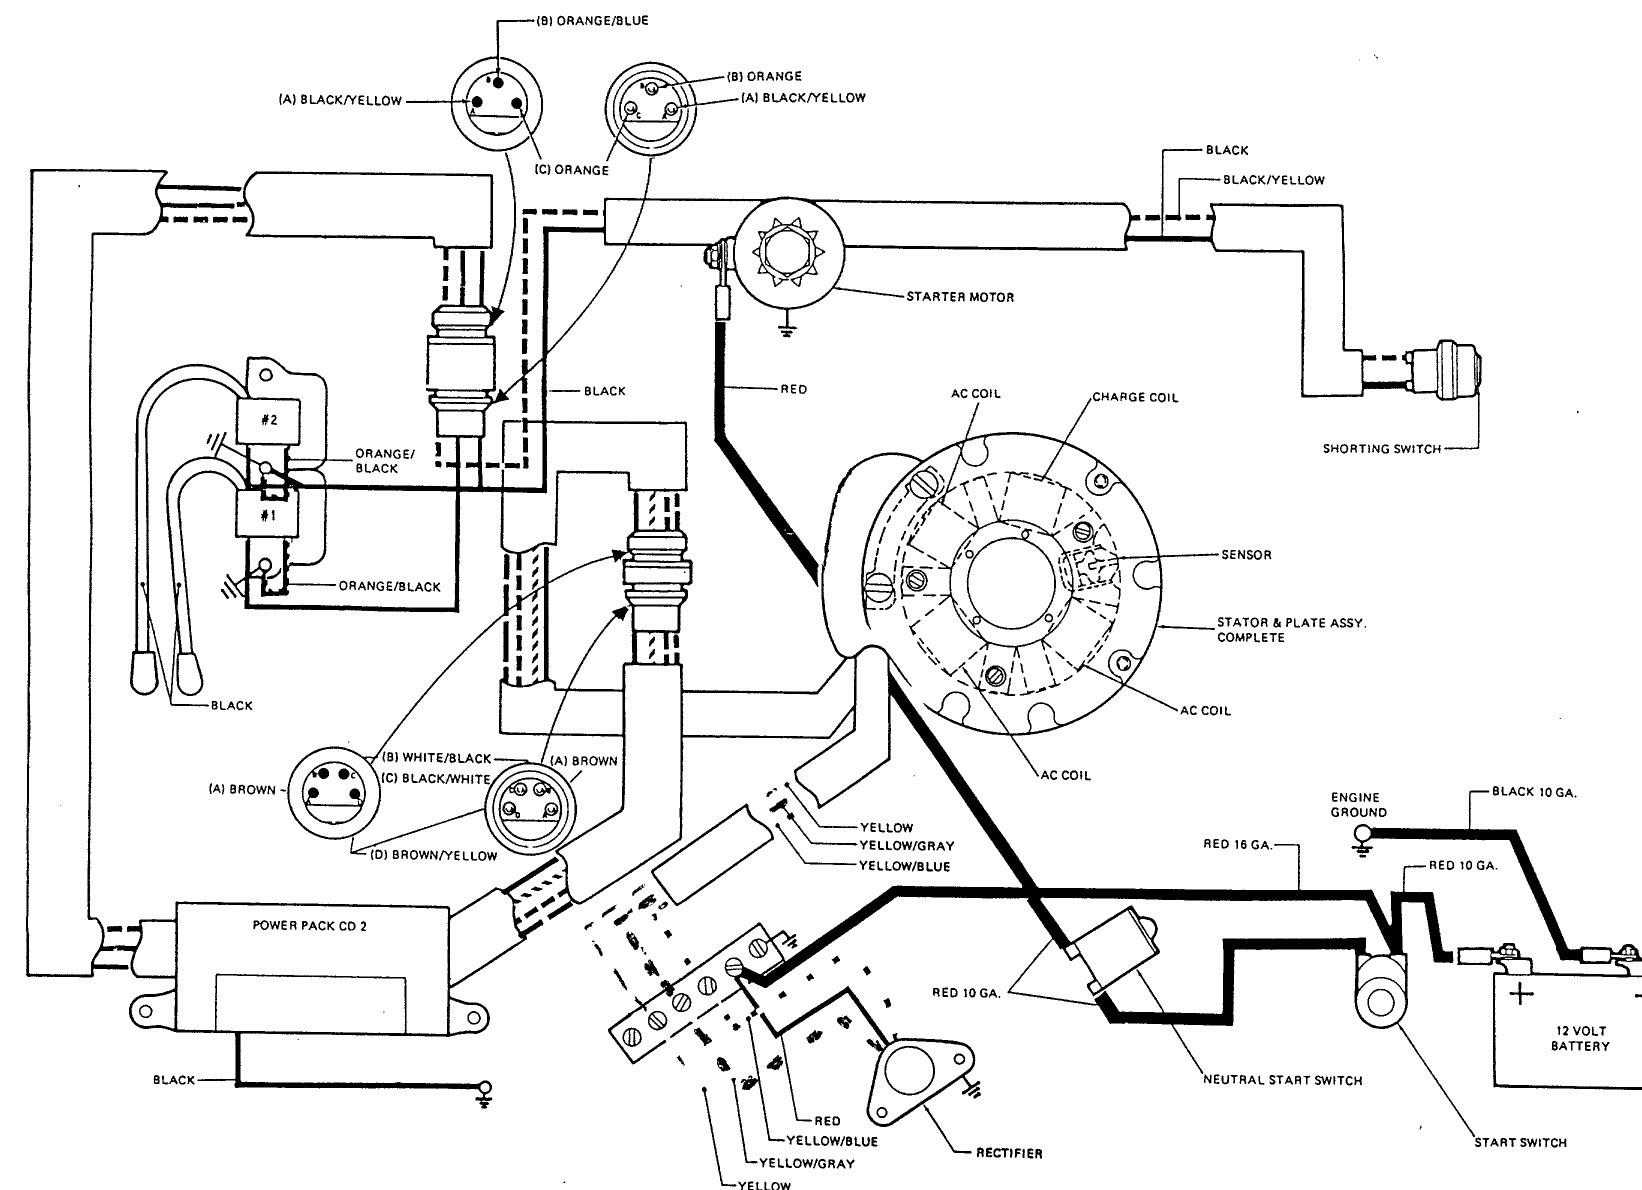 Marine Engine Diagram Sel Generator Control Panel Wiring Ac Gas Turbine Parts Win S Online Of